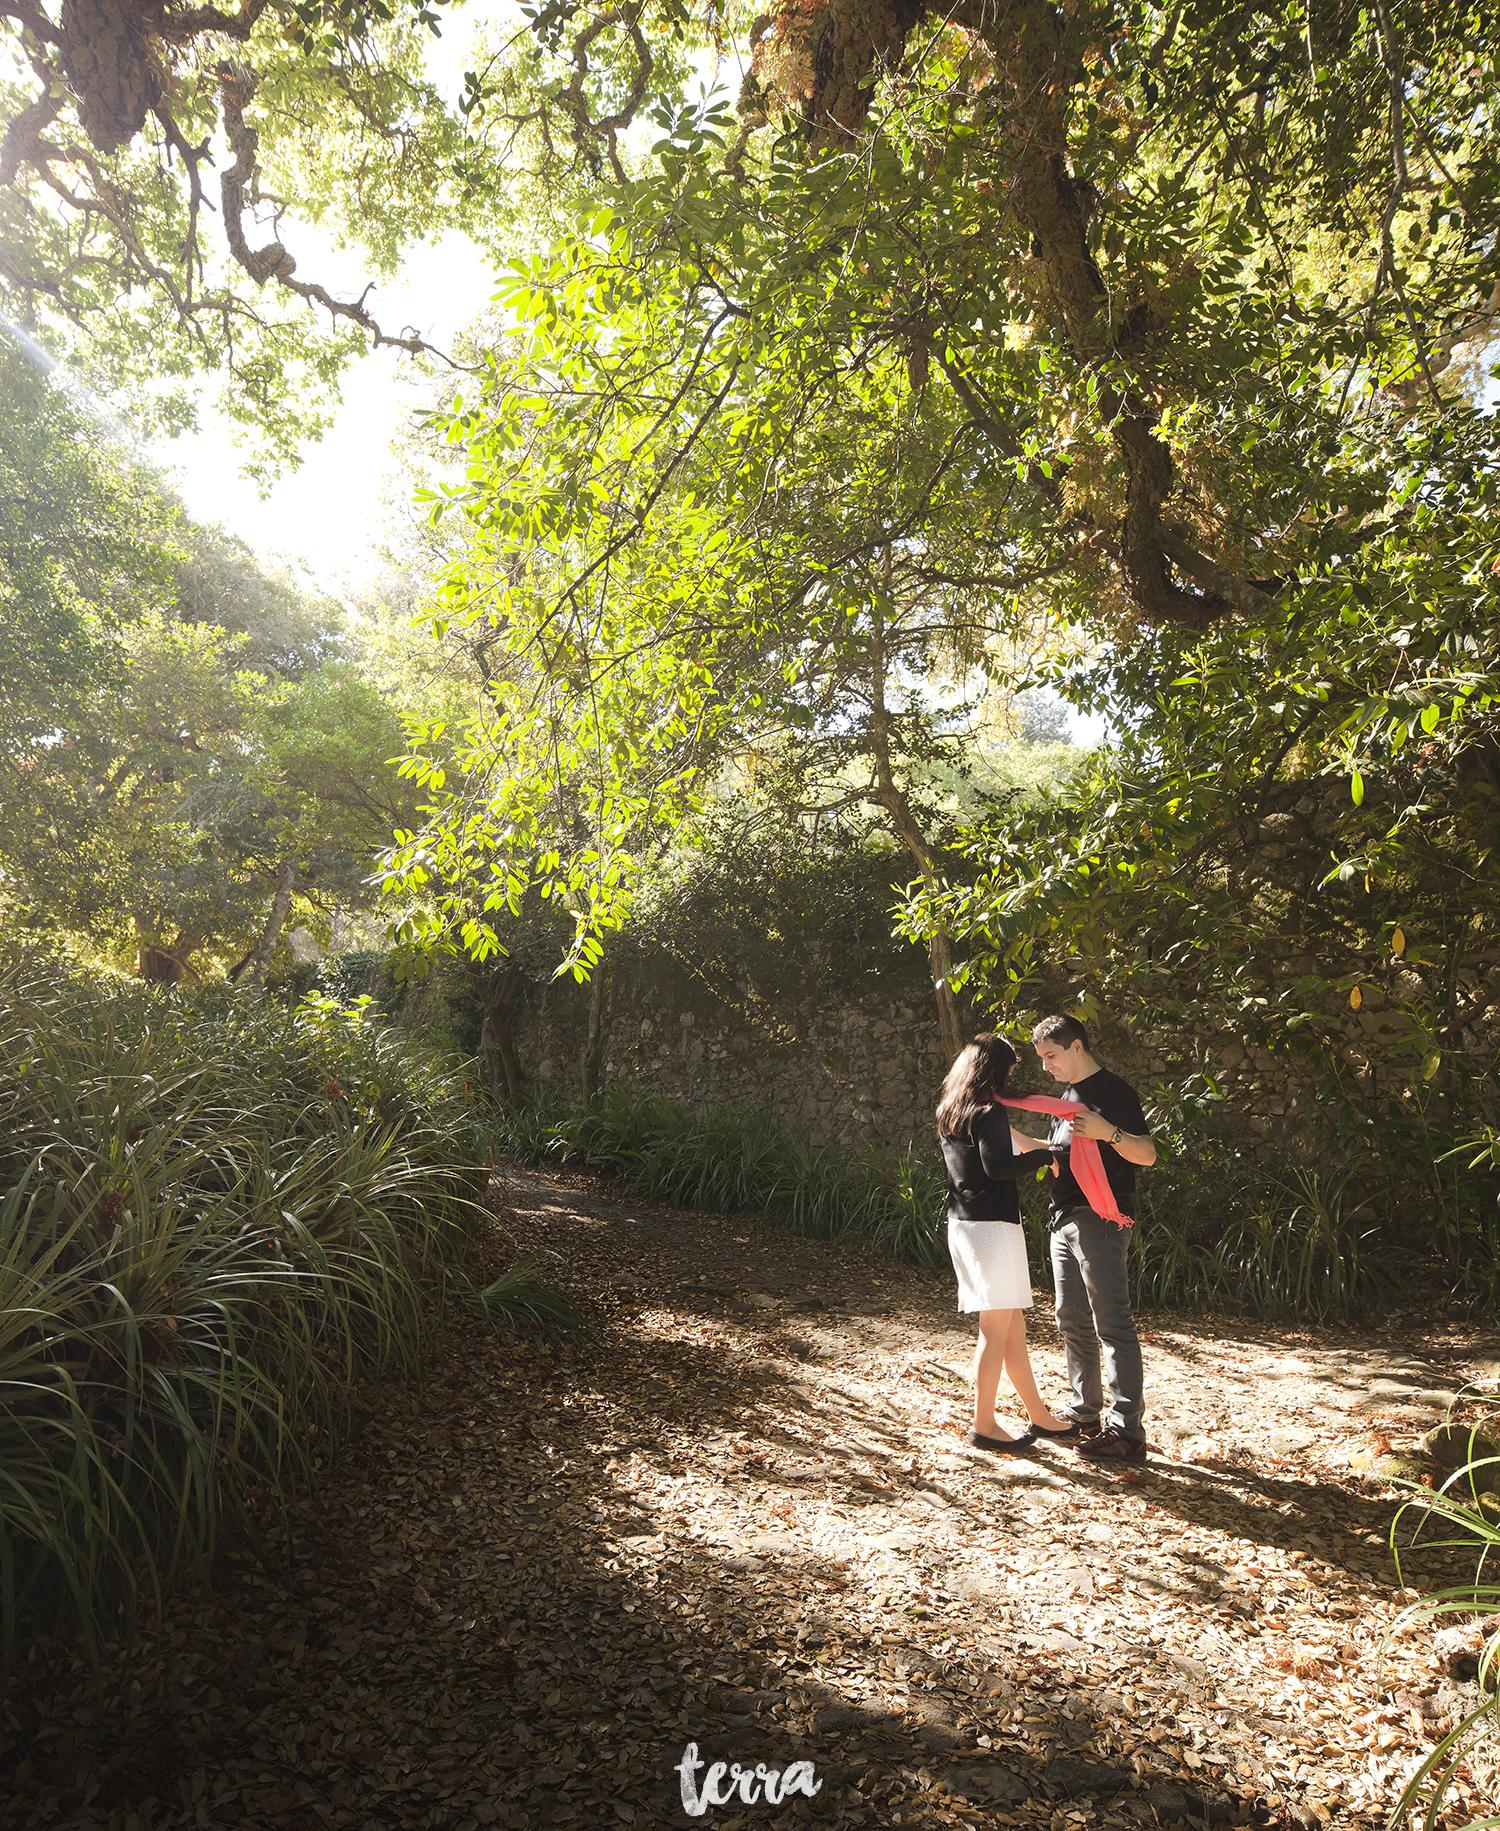 sessao-fotografica-parque-palacio-monserrate-sintra-terra-fotografia-0001.jpg